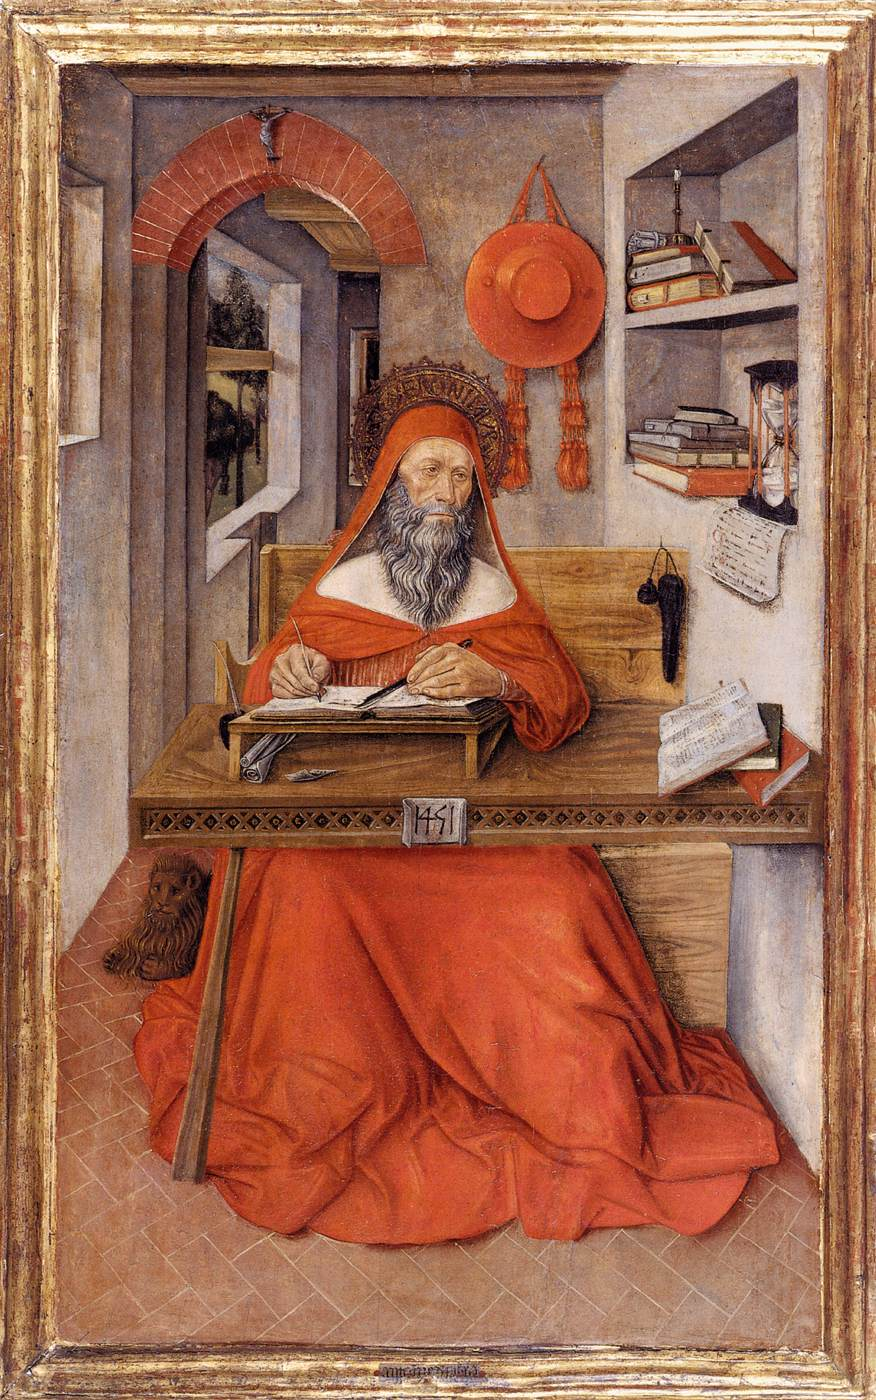 Antonio da Fabriano, Saint Jérôme, Walters Art Museum, Baltimore, 1451 (source : wga)